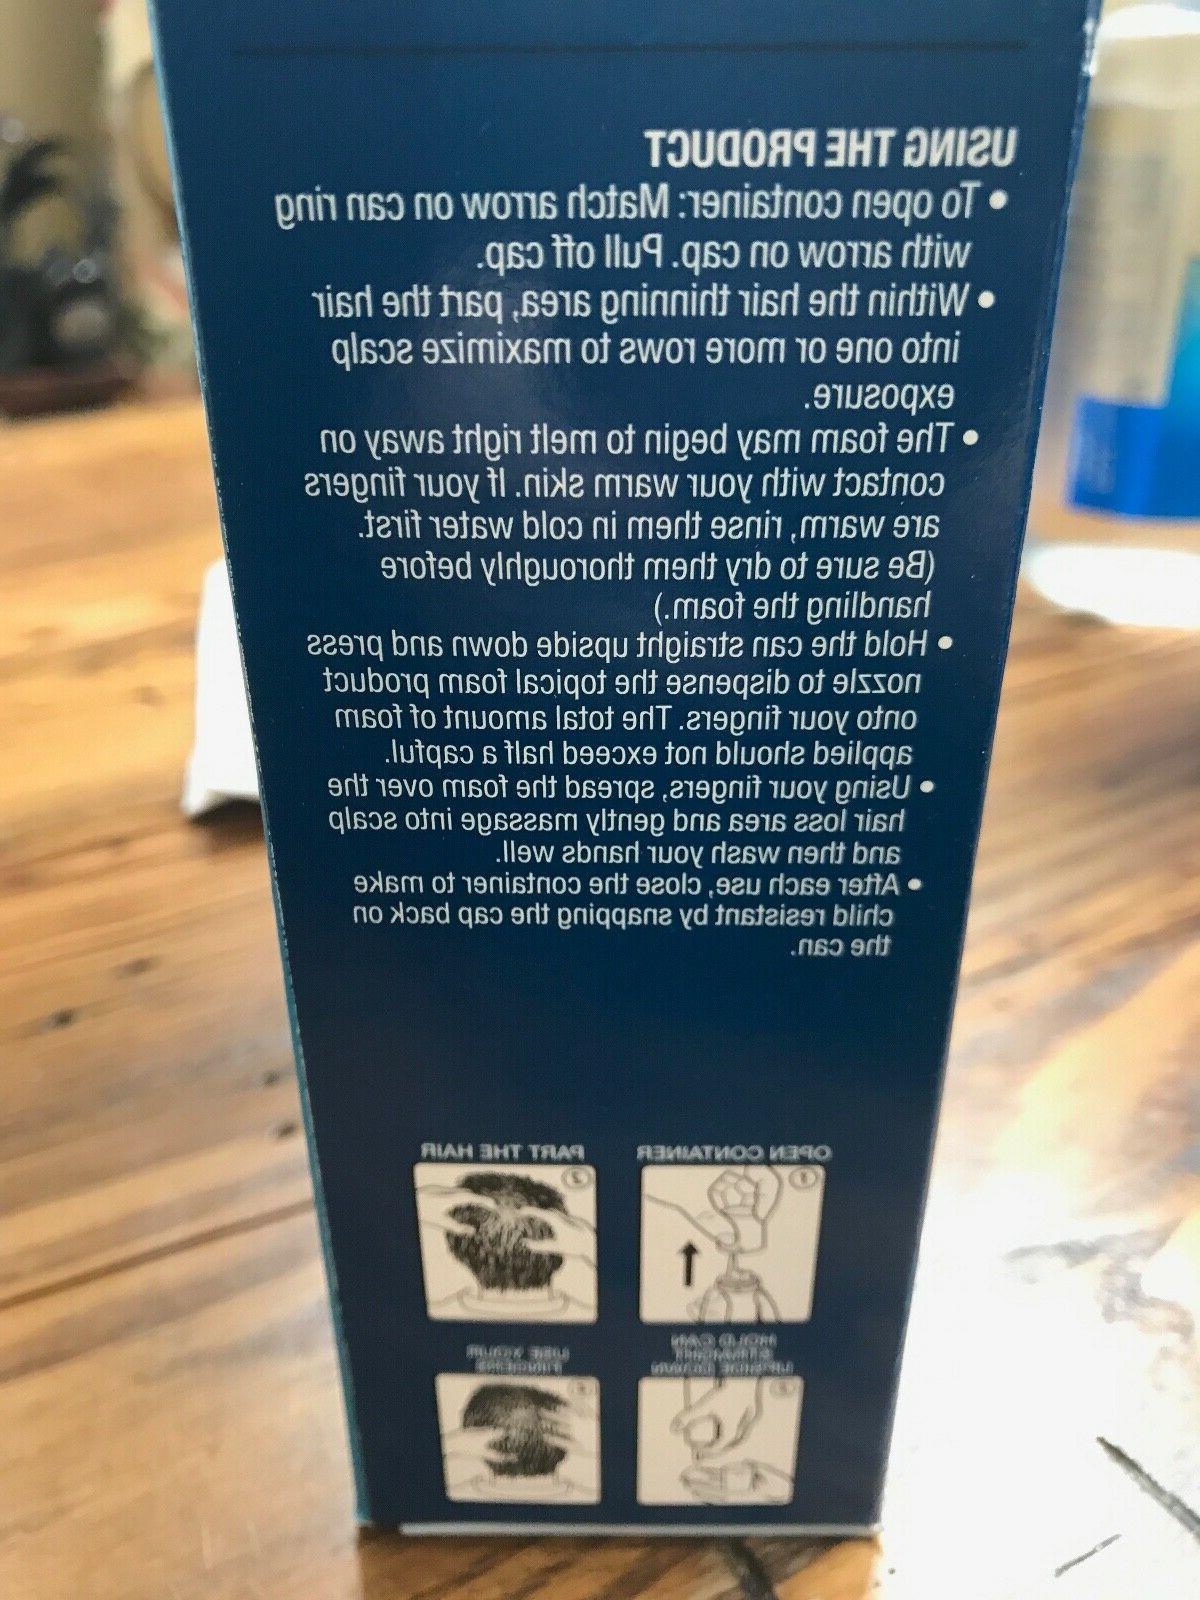 Kirkland Hair Regrowth Treatment Minoxidil 5% Foam for Men - 1 Supply